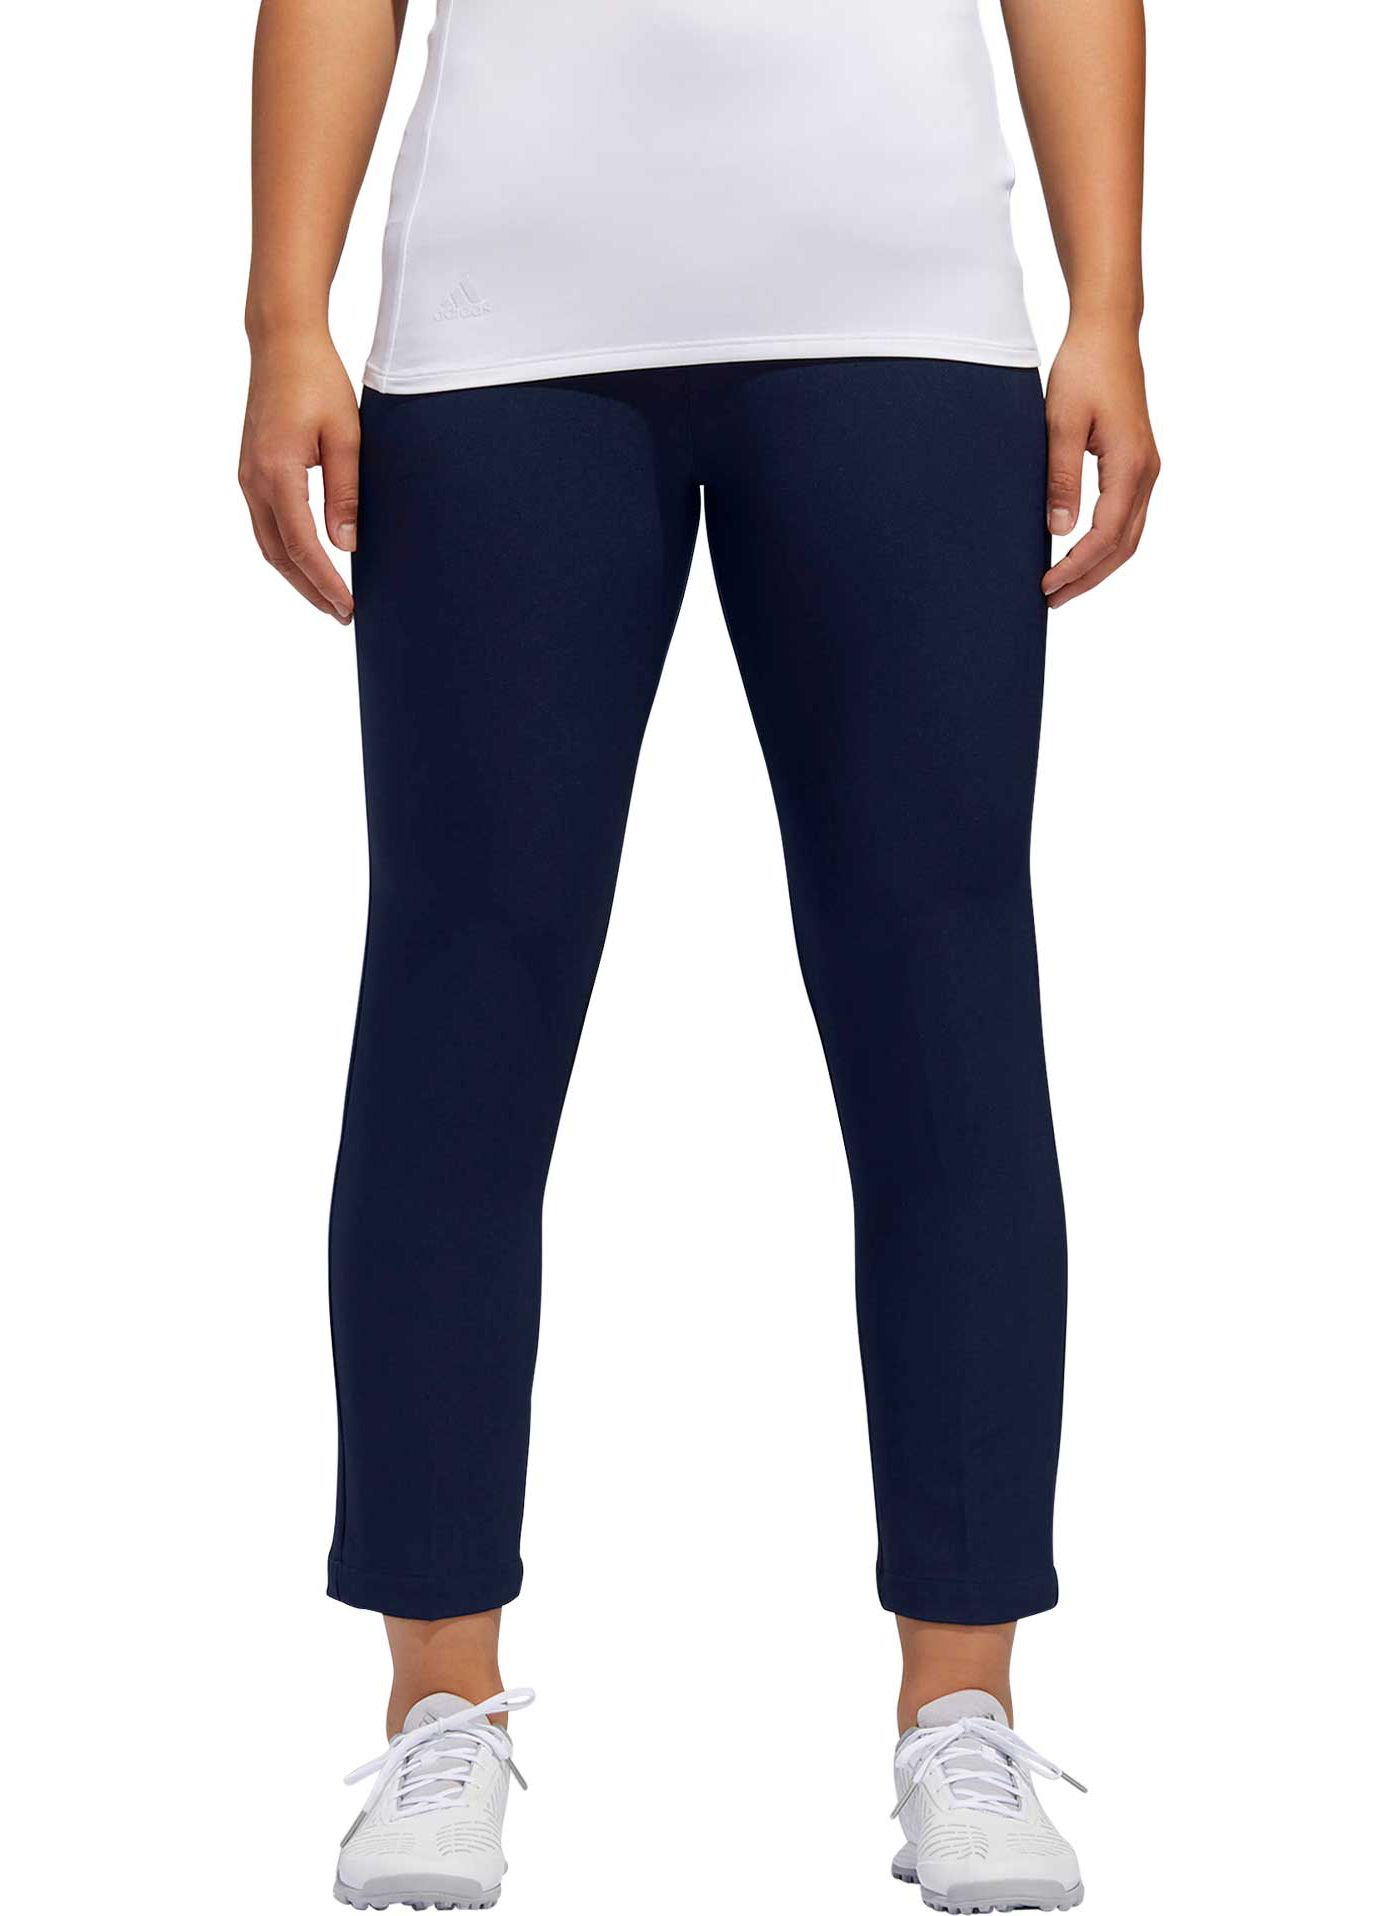 adidas Women's Ultimate365 adistar Ankle Golf Pants